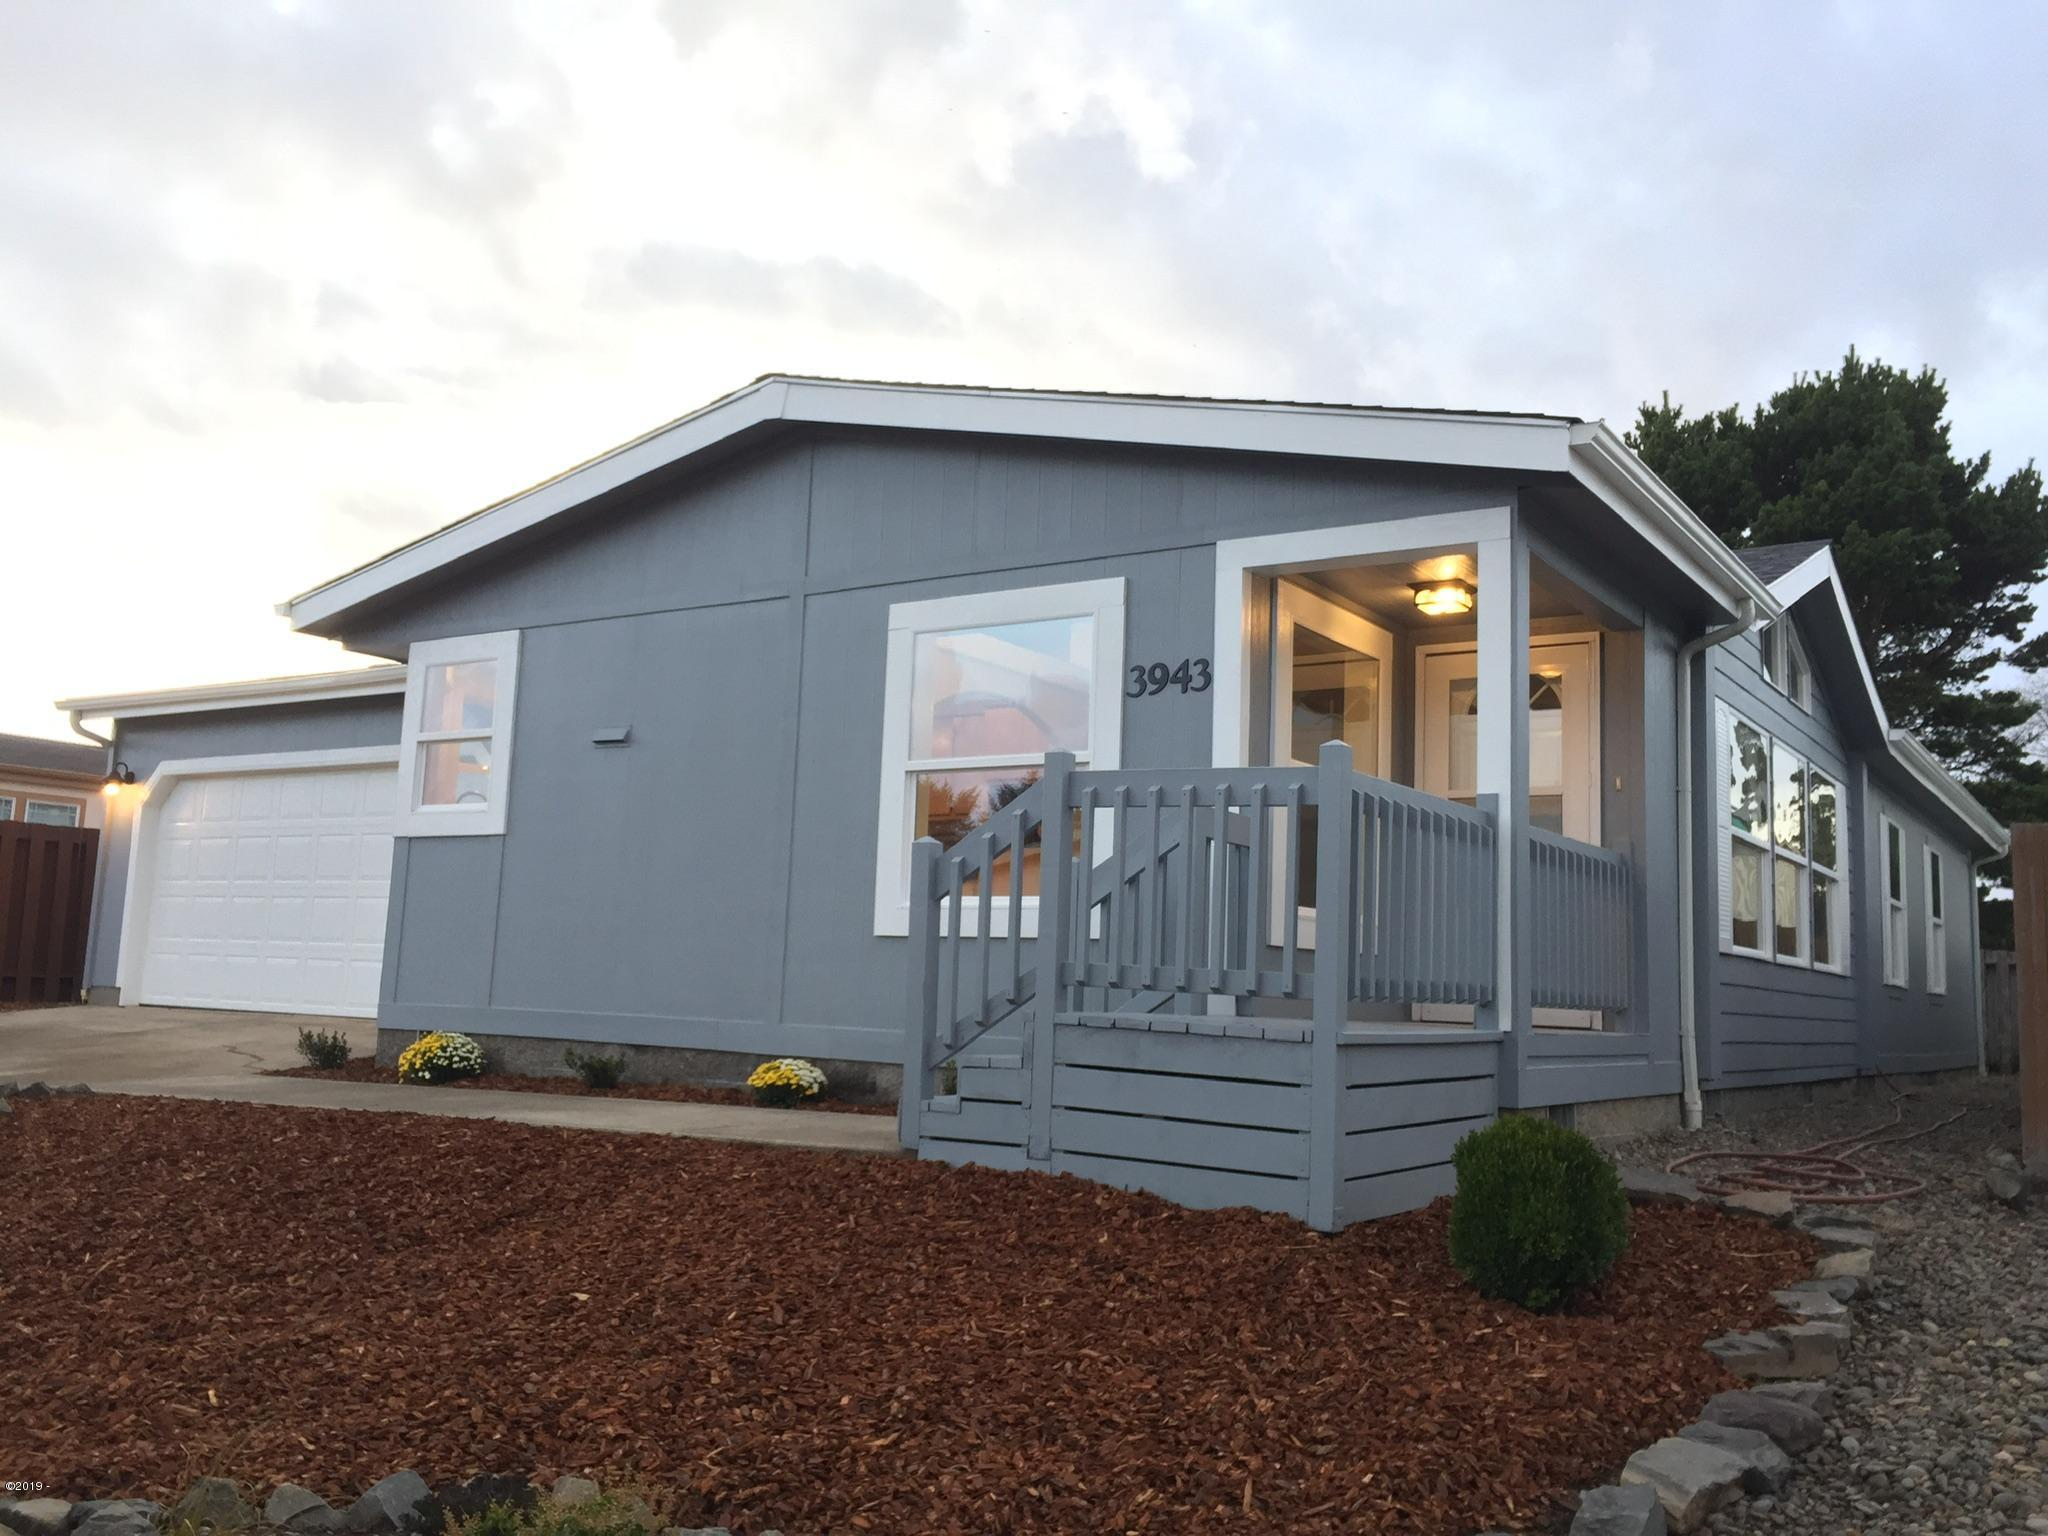 3943 Summit Ridge Cir, Depoe Bay, OR 97341 - Welcome Home!